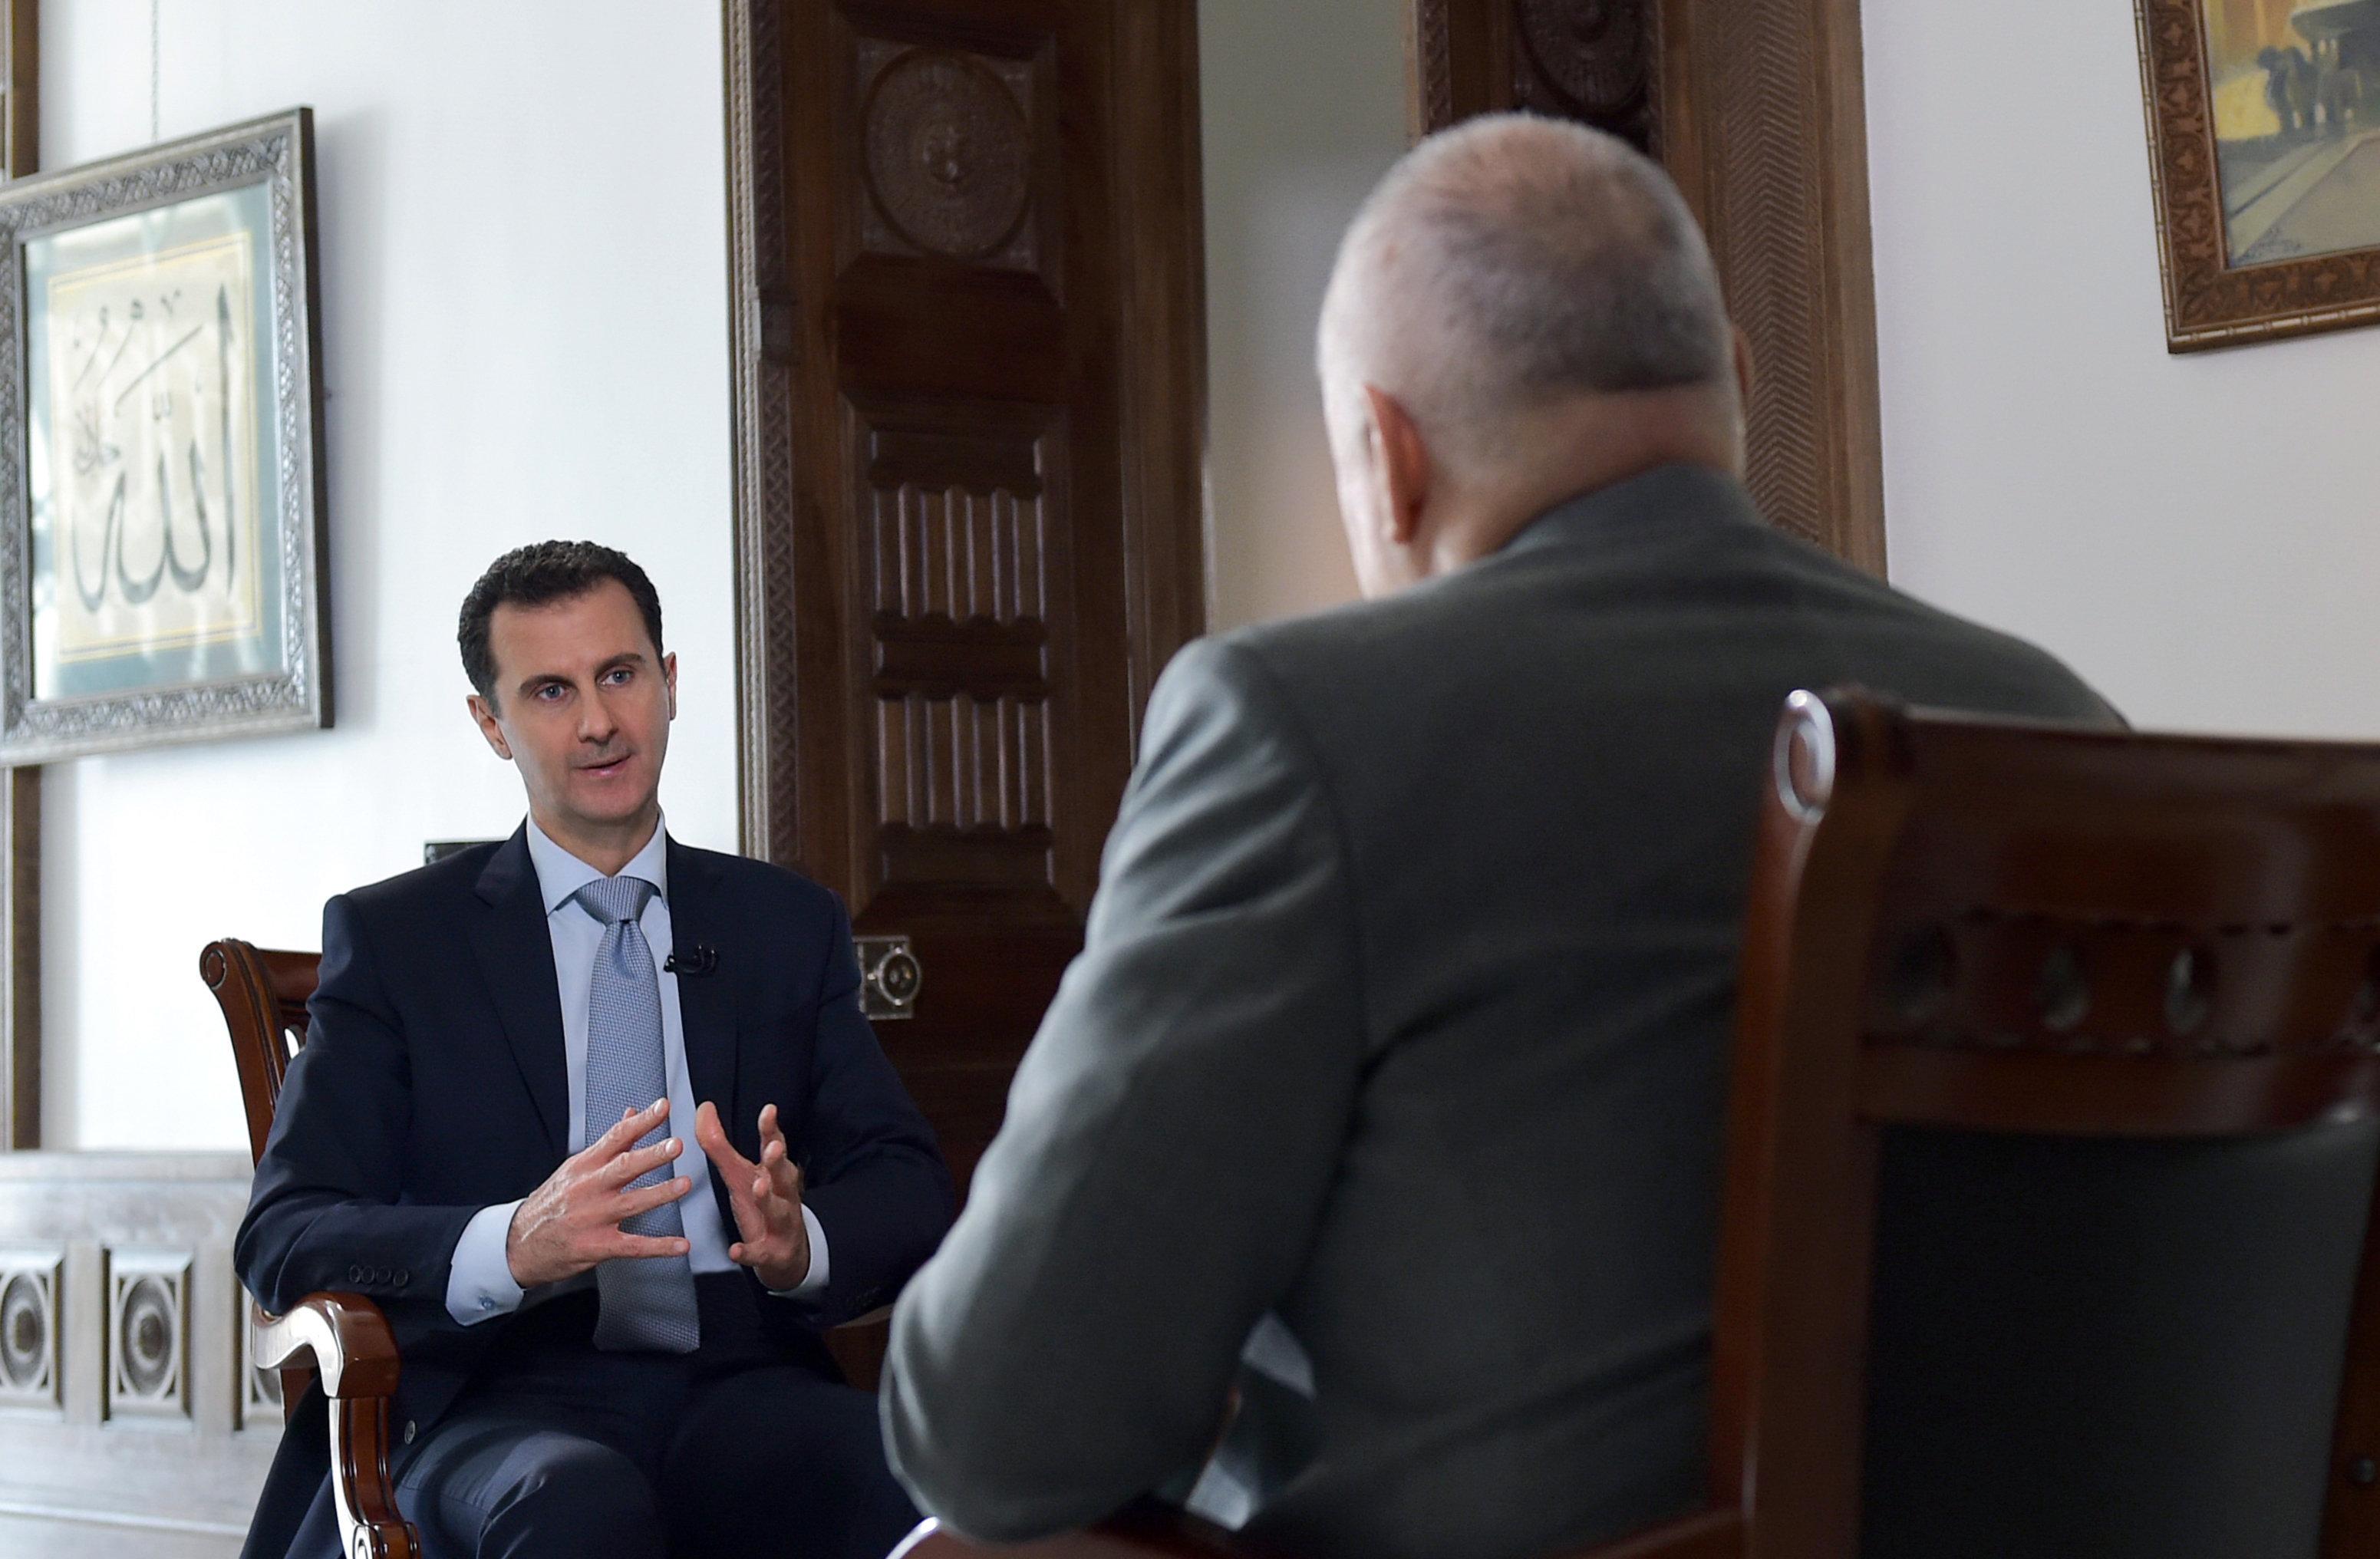 Интервью президента Сирии Б. Асада гендиректору МИА Россия сегодня Д. Киселеву